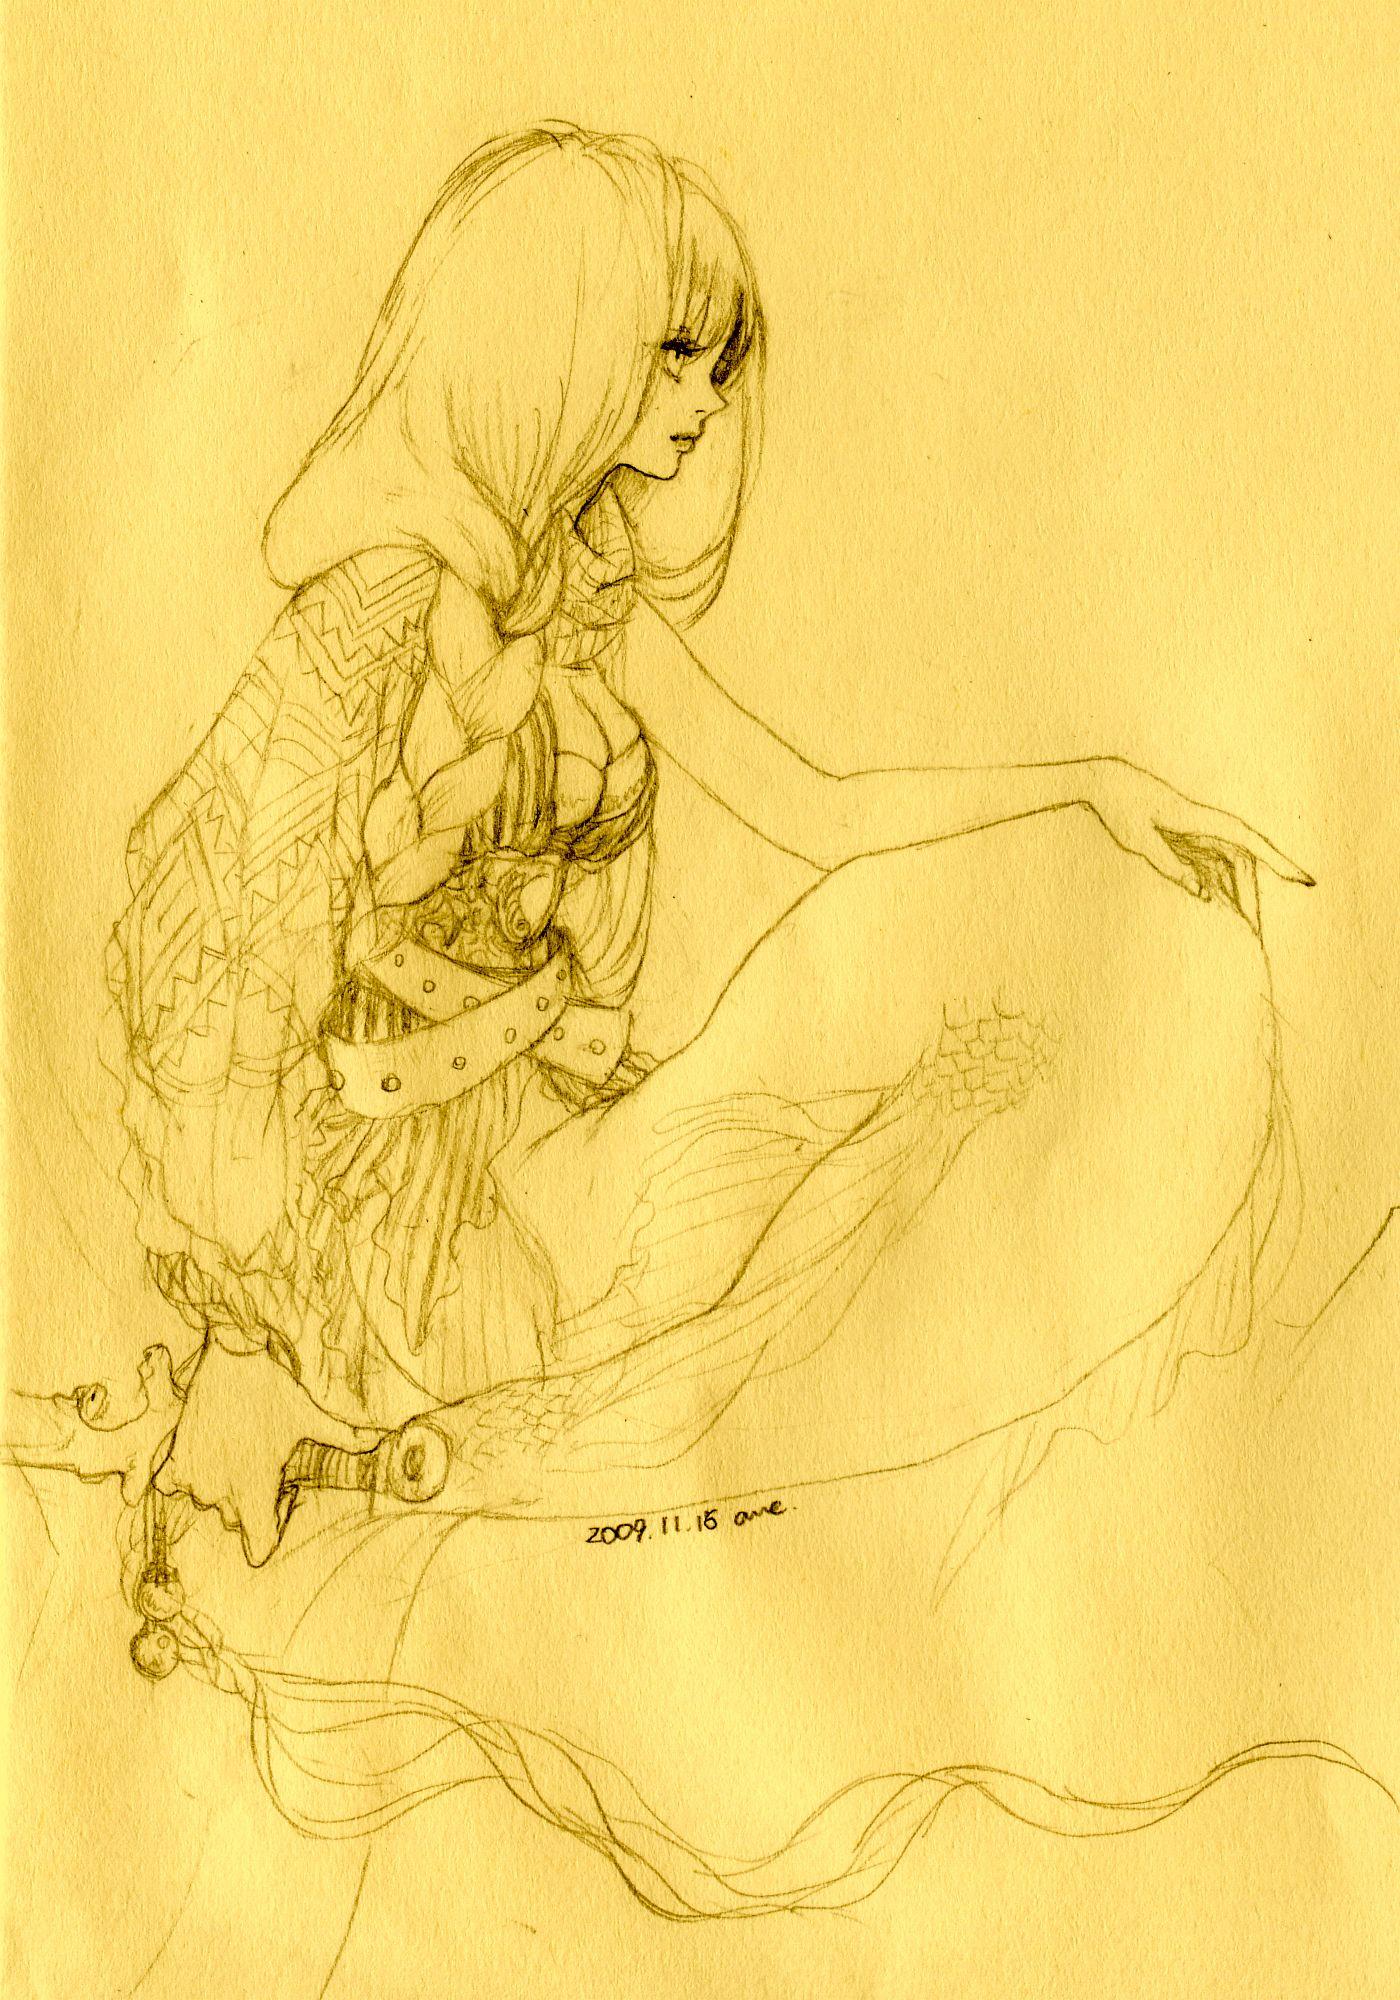 f:id:doodledoo:20091117000508j:image